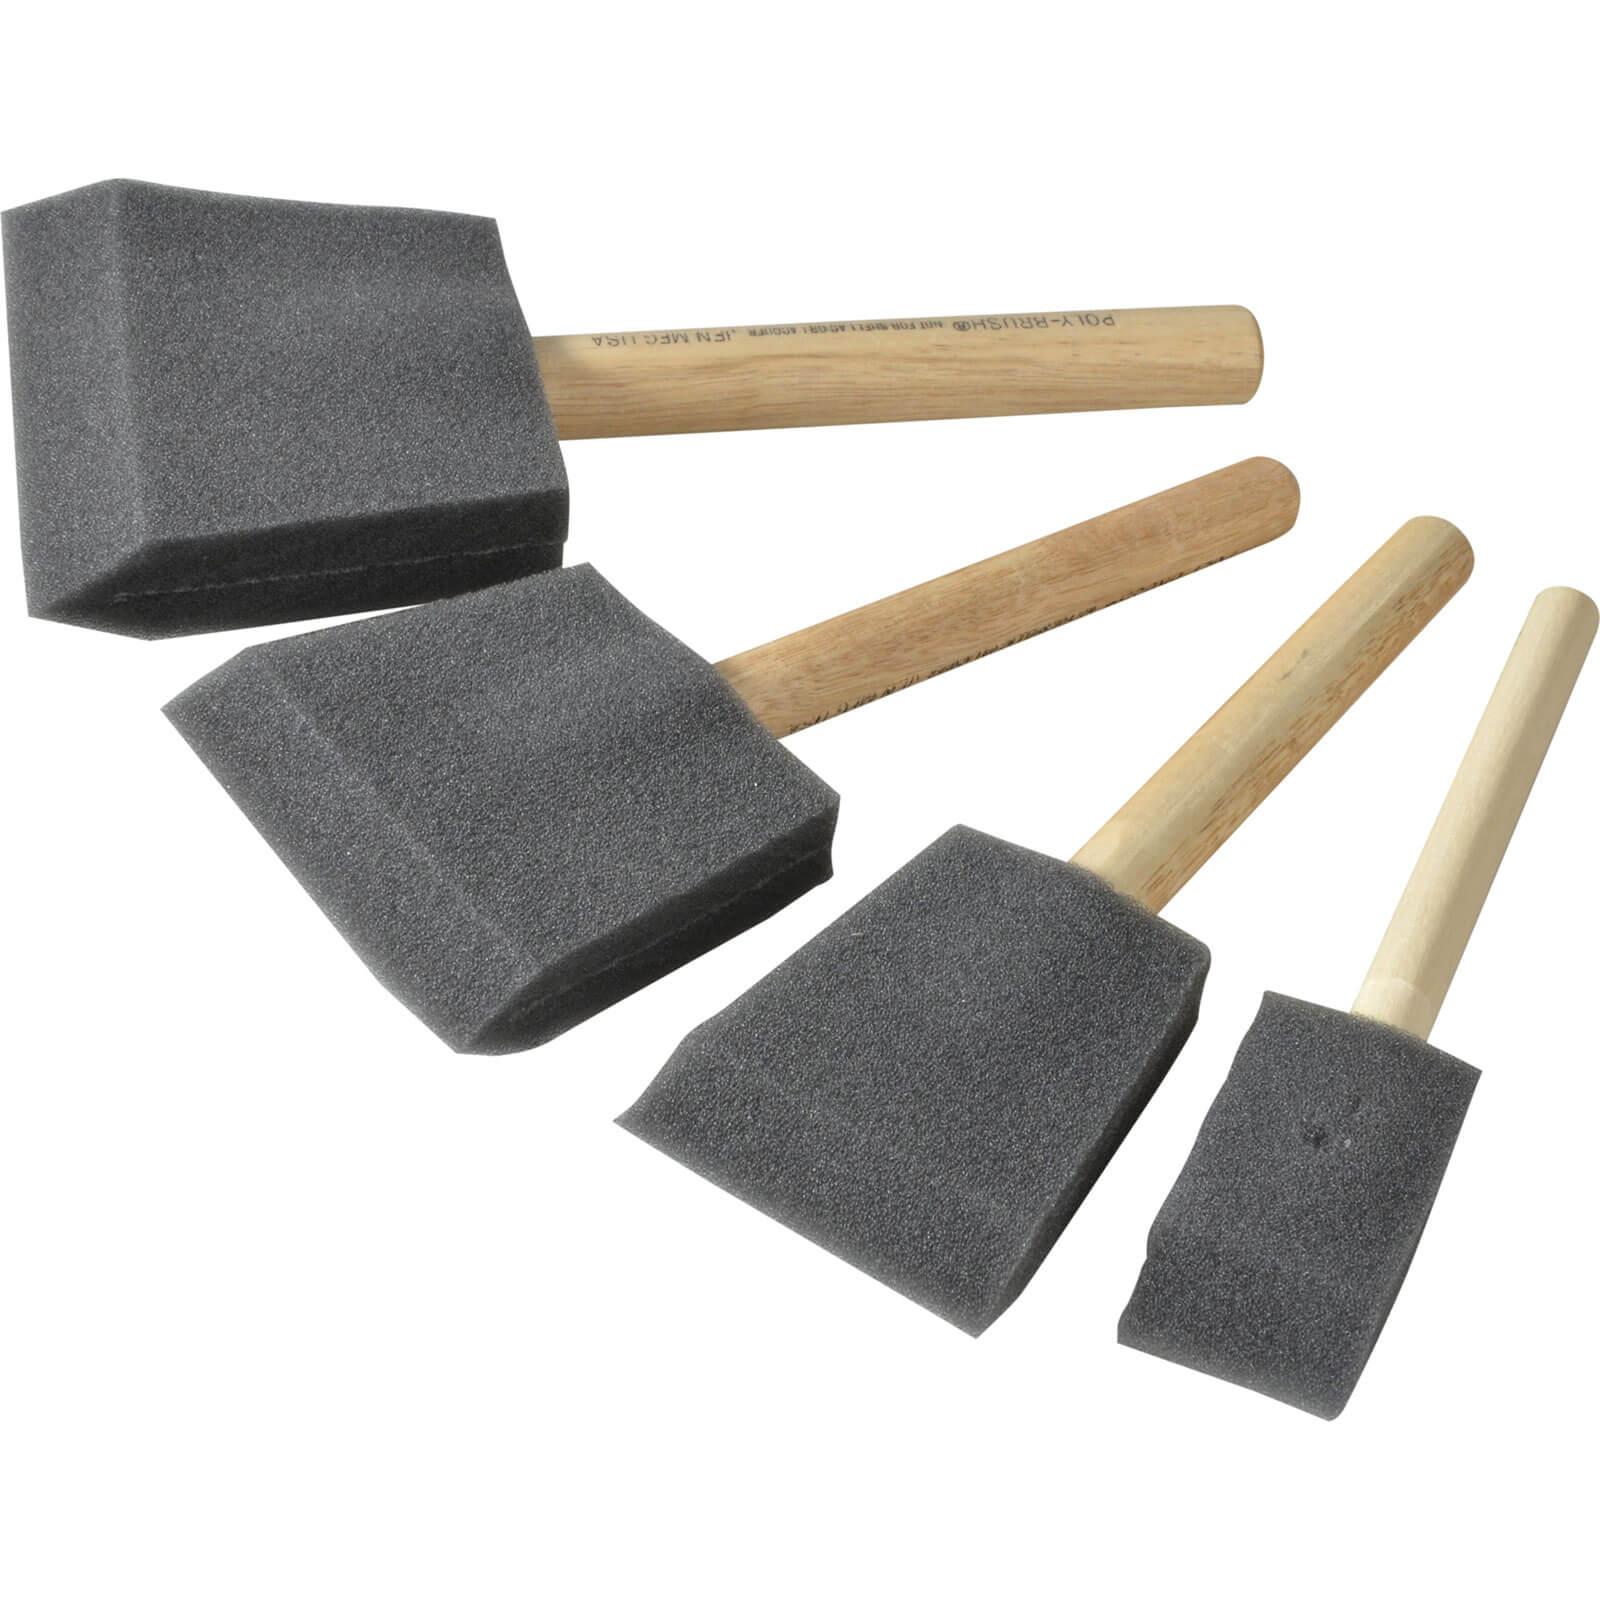 Image of Rustins 4 Piece Foam Brush Set